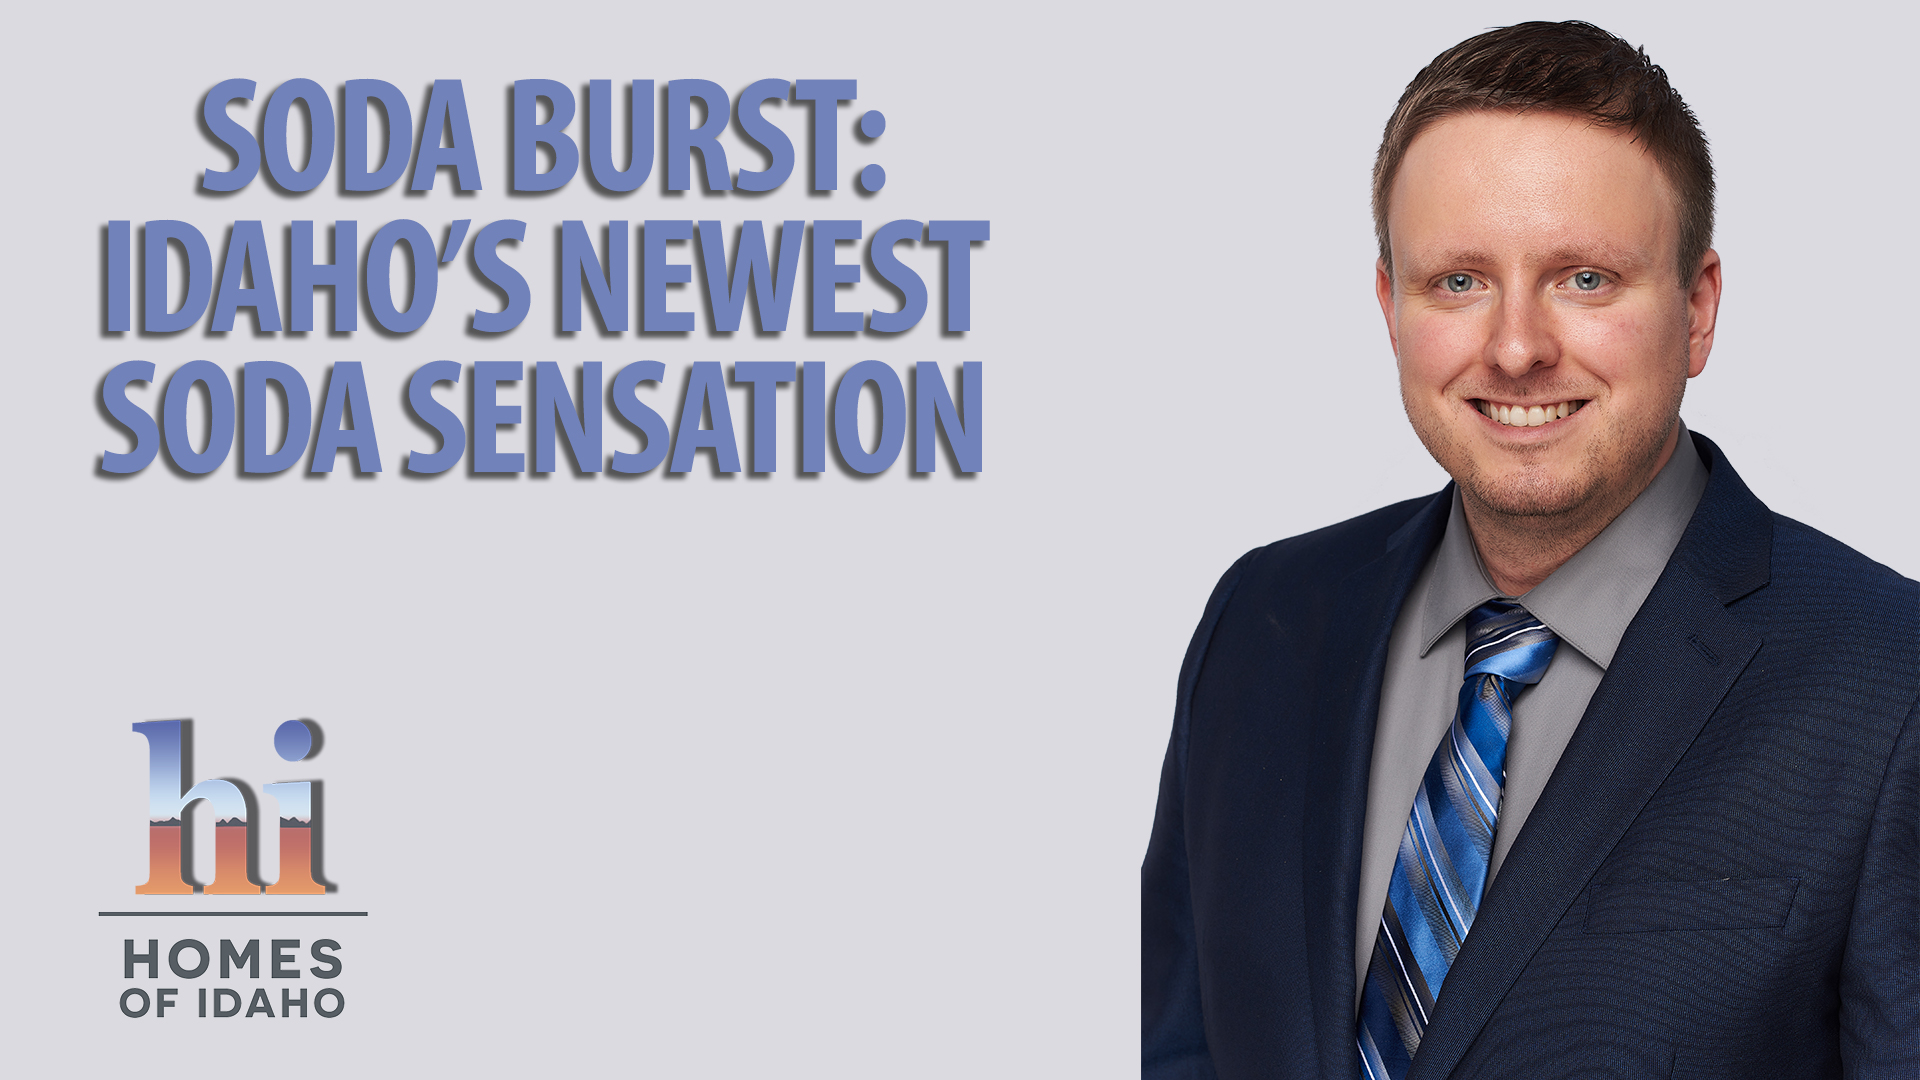 Shining a Spotlight on Soda Burst, a New Caldwell Business